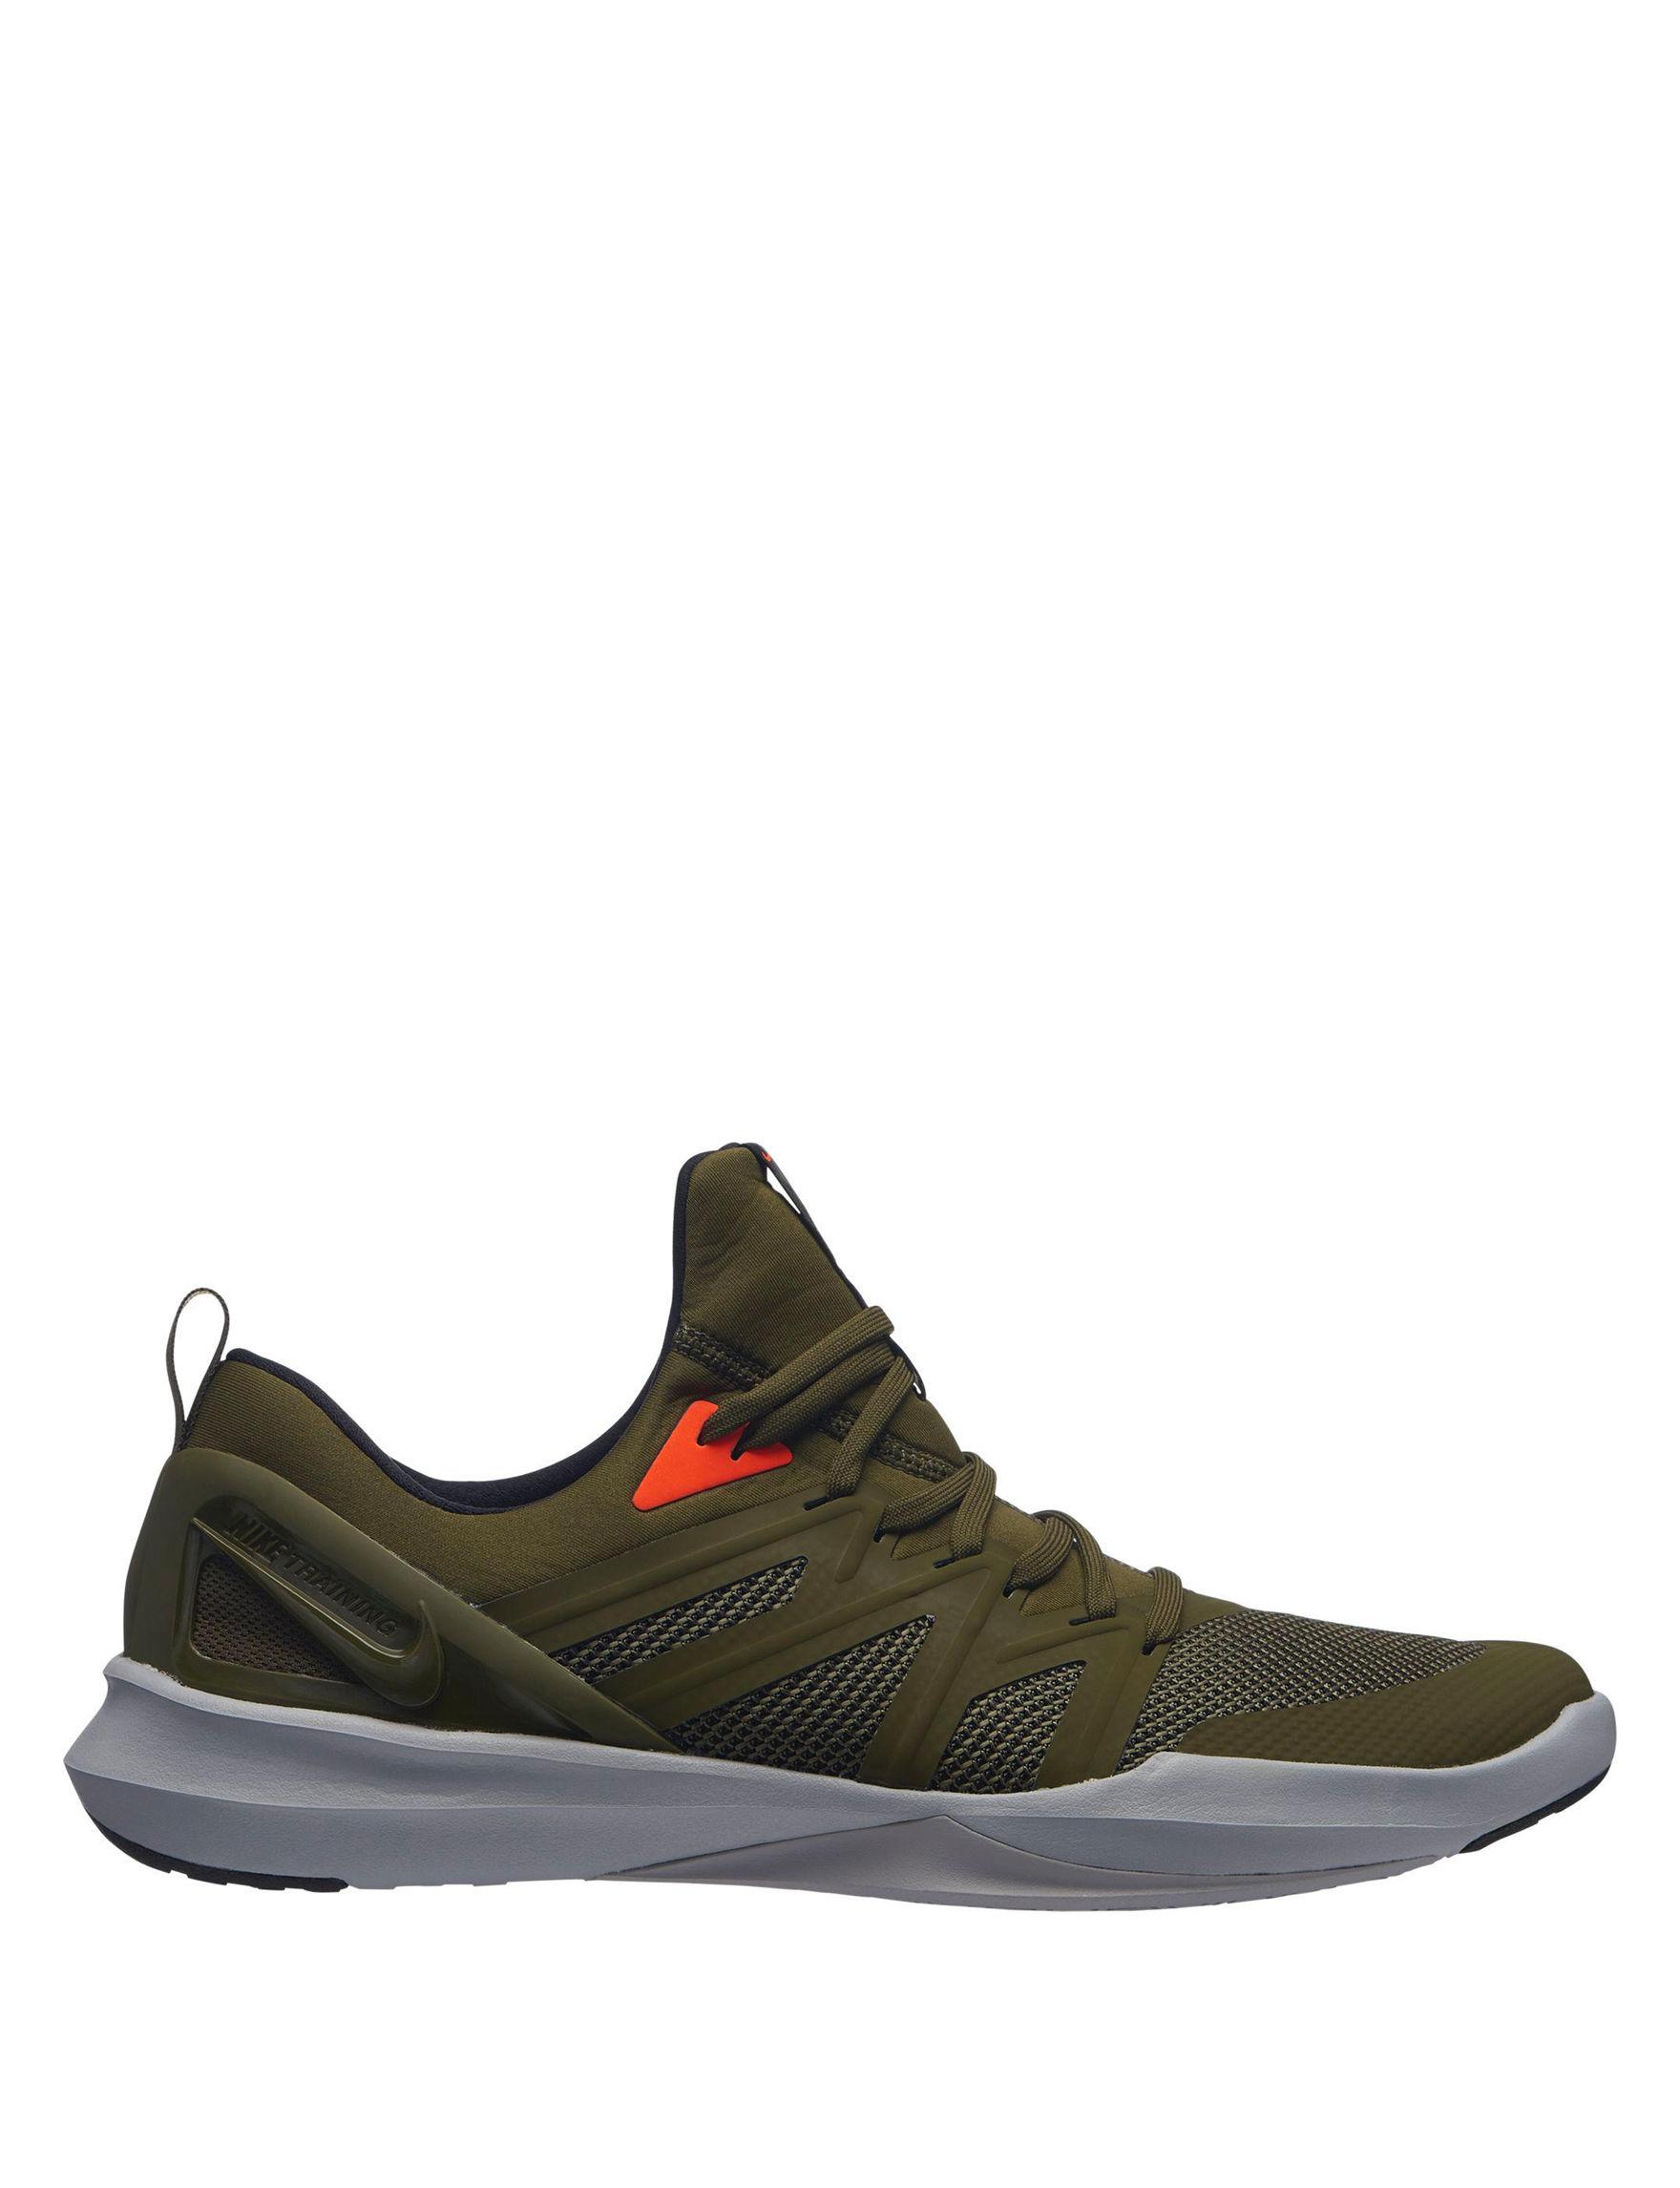 9813379109eb2 Nike Men s Victory Elite Trainer Training Shoes